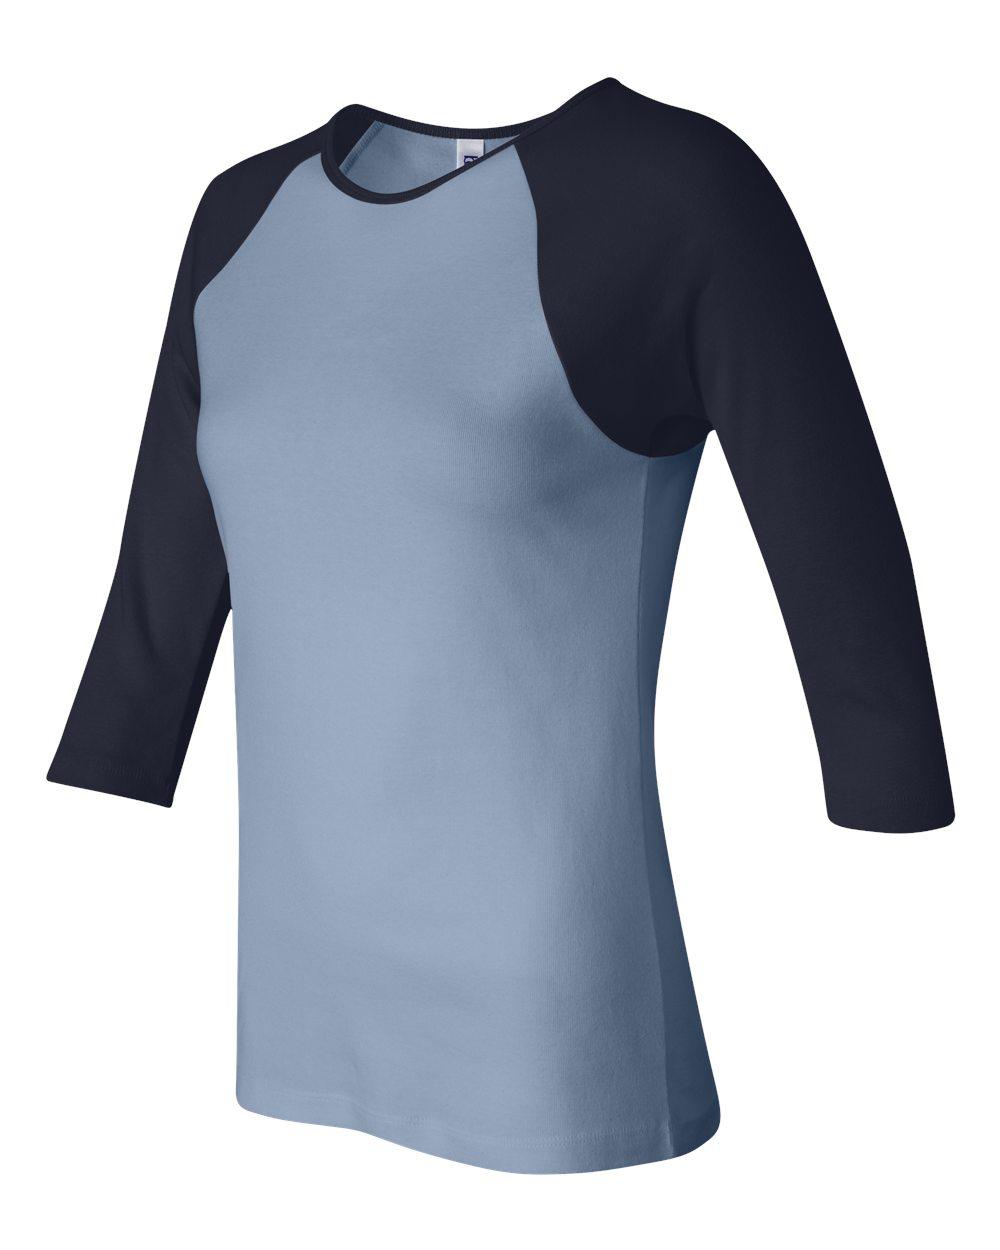 Bella-Canvas-Womens-Stretch-Rib-3-4-Sleeve-Contrast-Raglan-T-Shirt-B2000 thumbnail 4